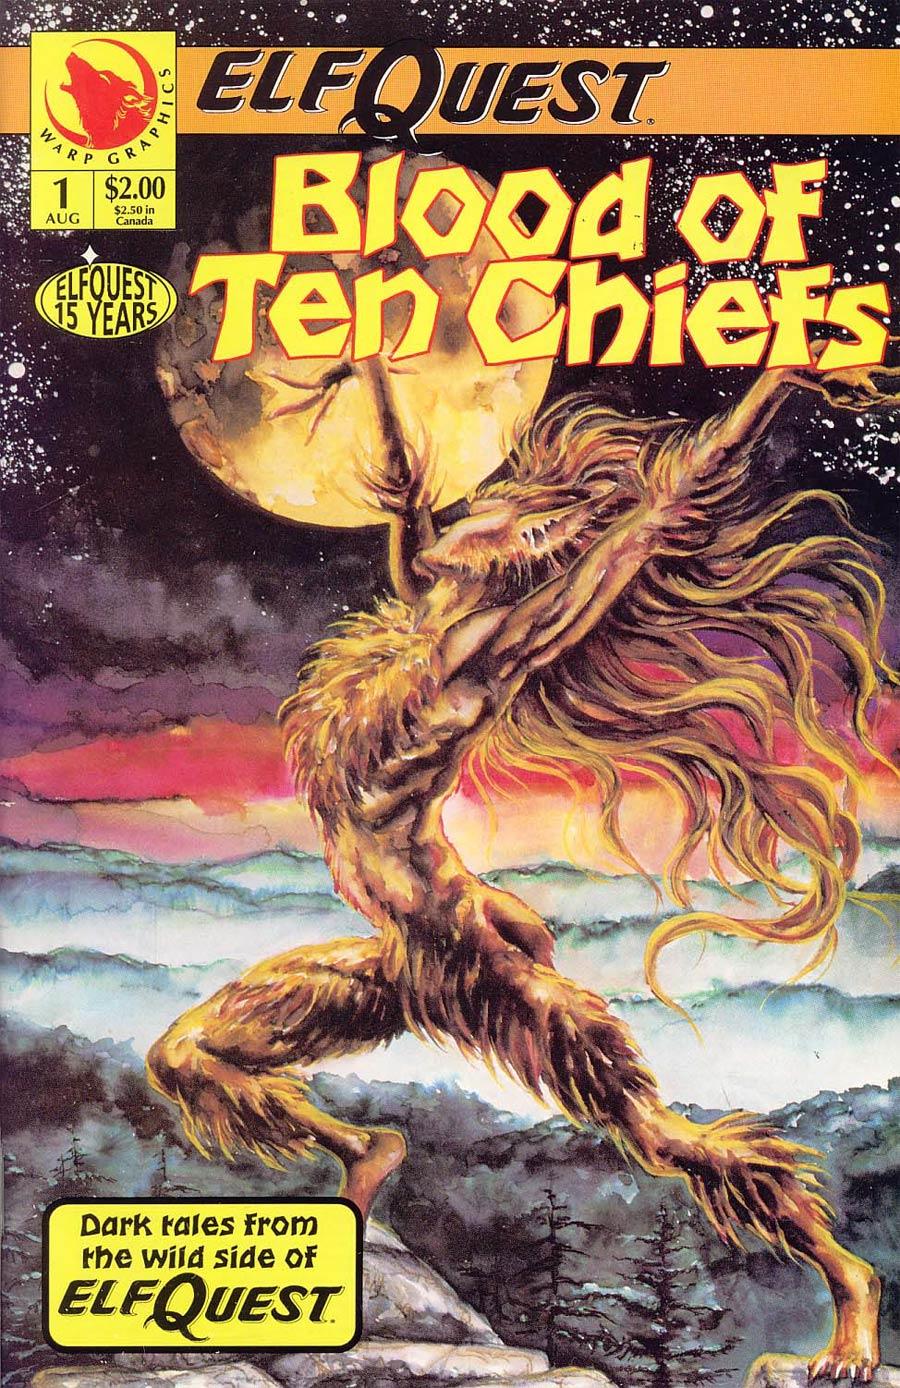 Elfquest Blood Of Ten Chiefs #1